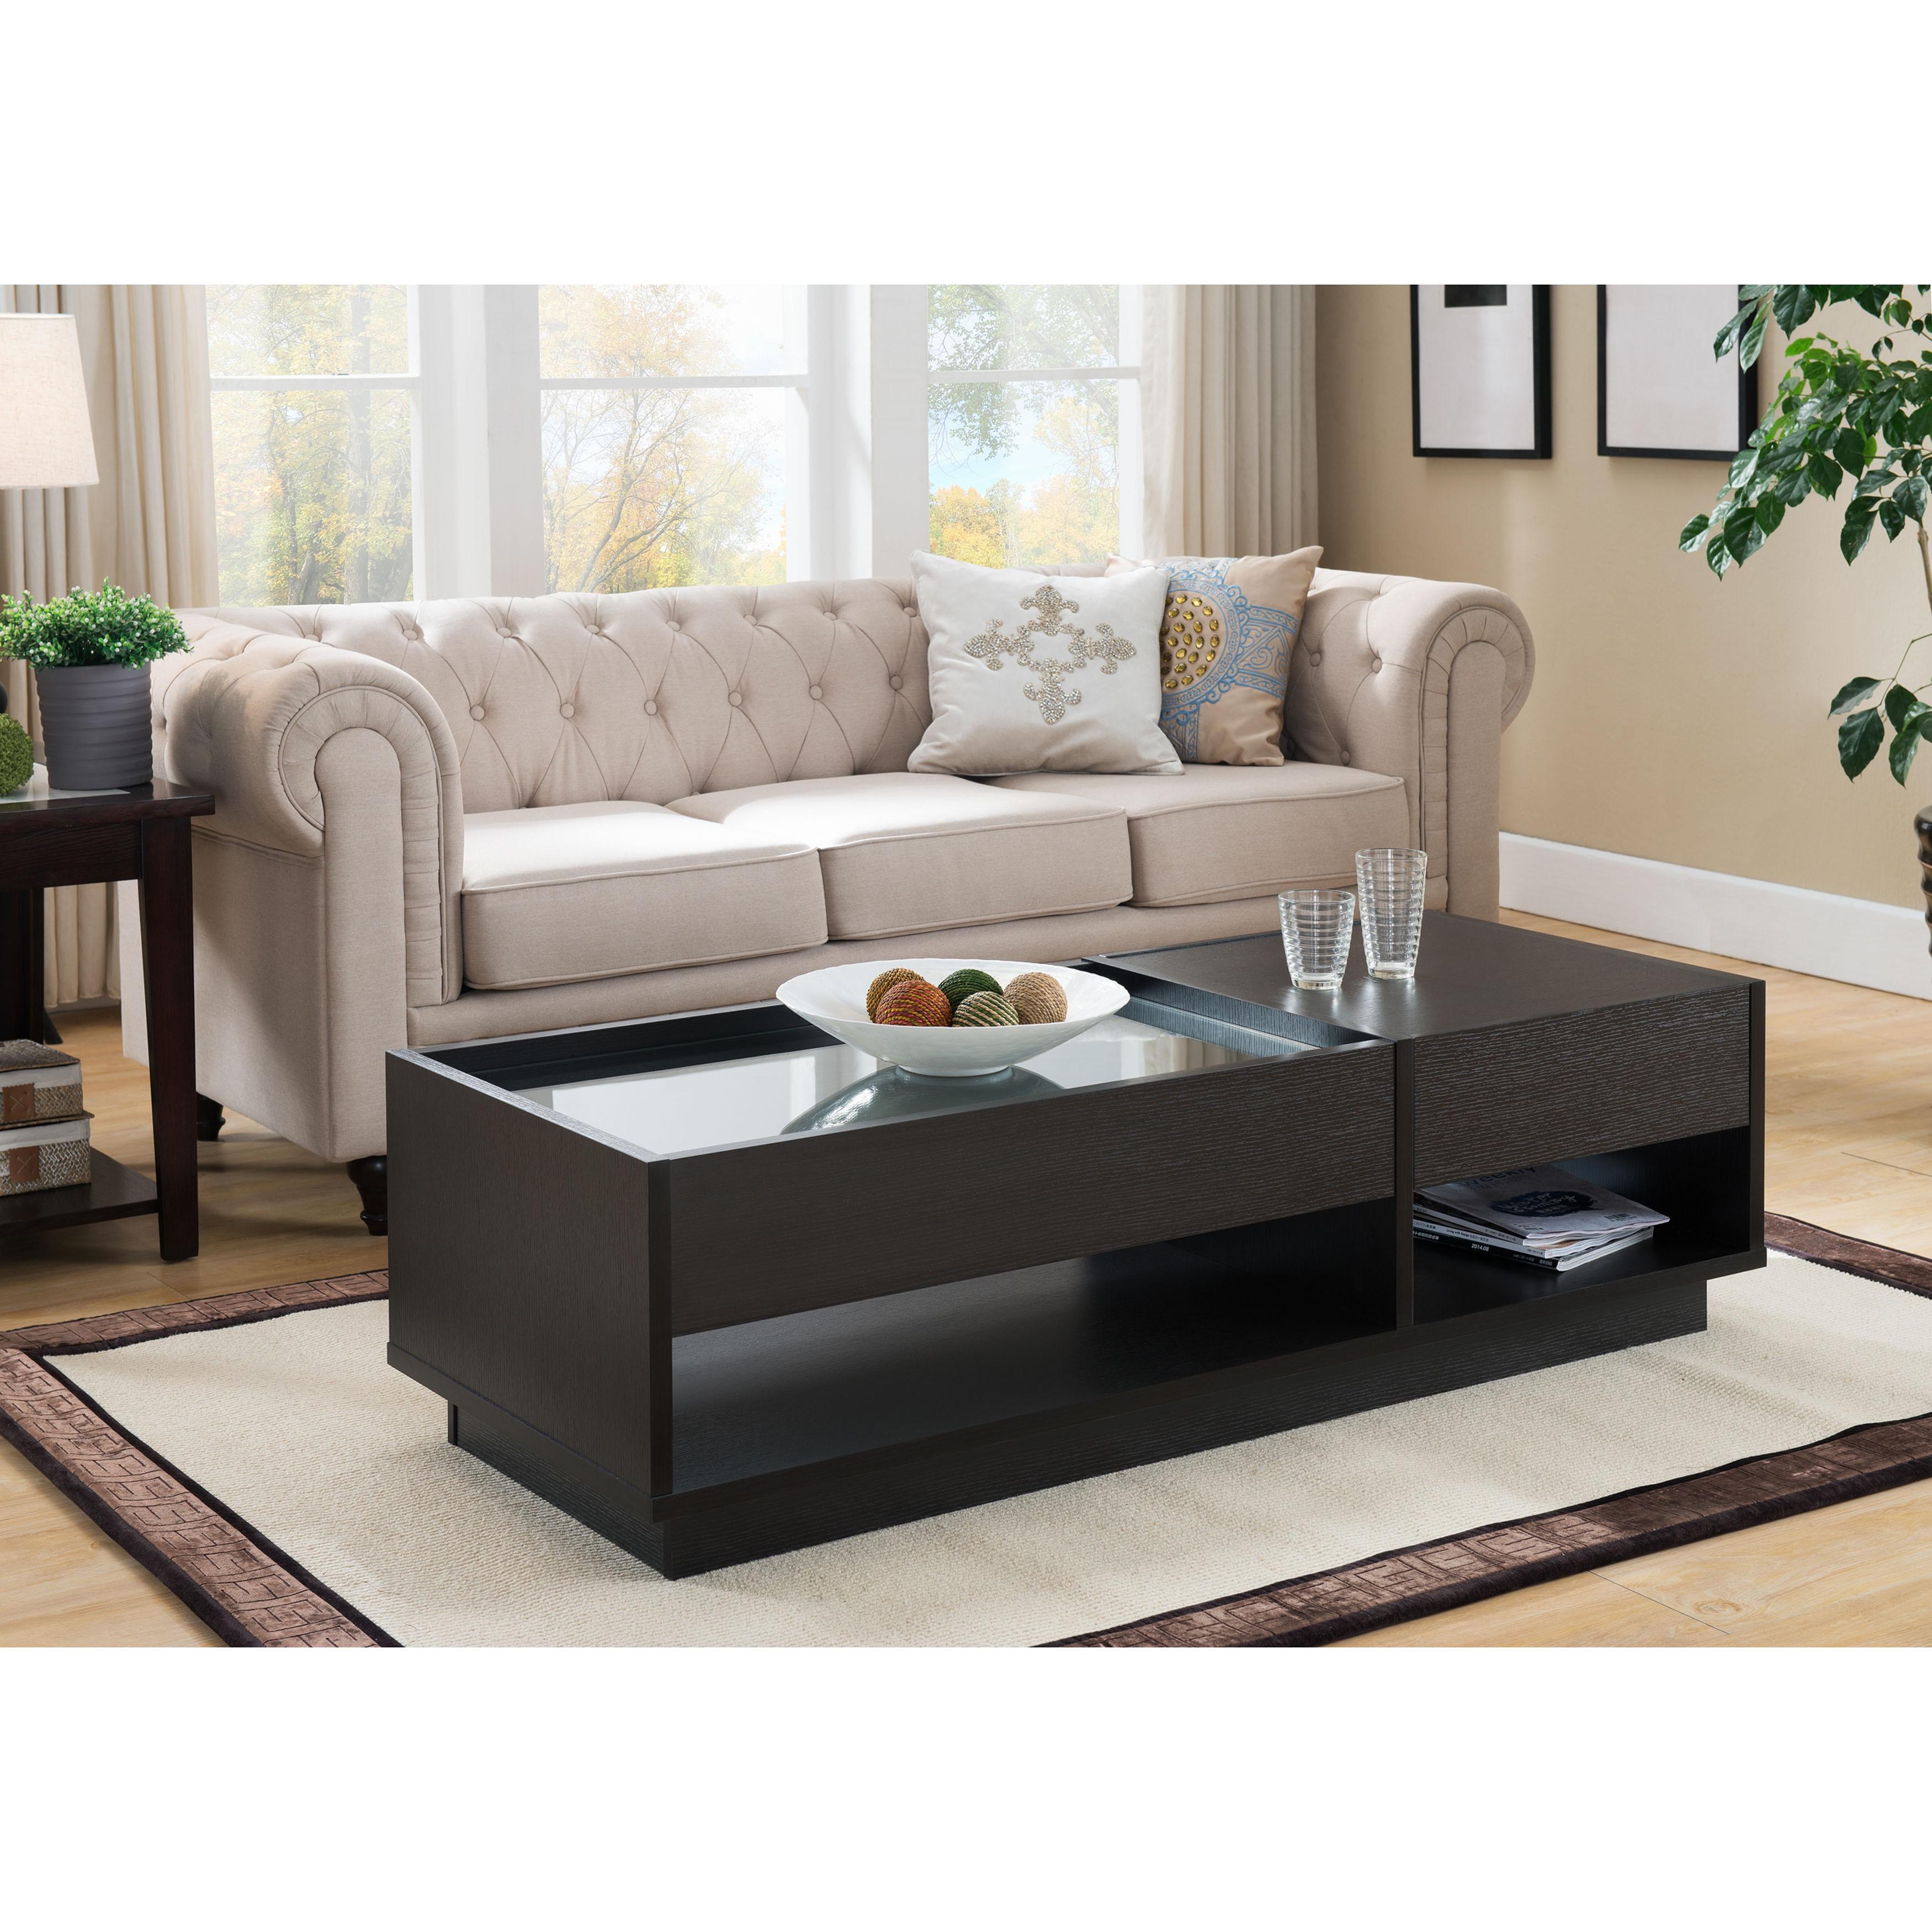 Furniture of America Lepton Modern Cappuccino 2 drawer Glass